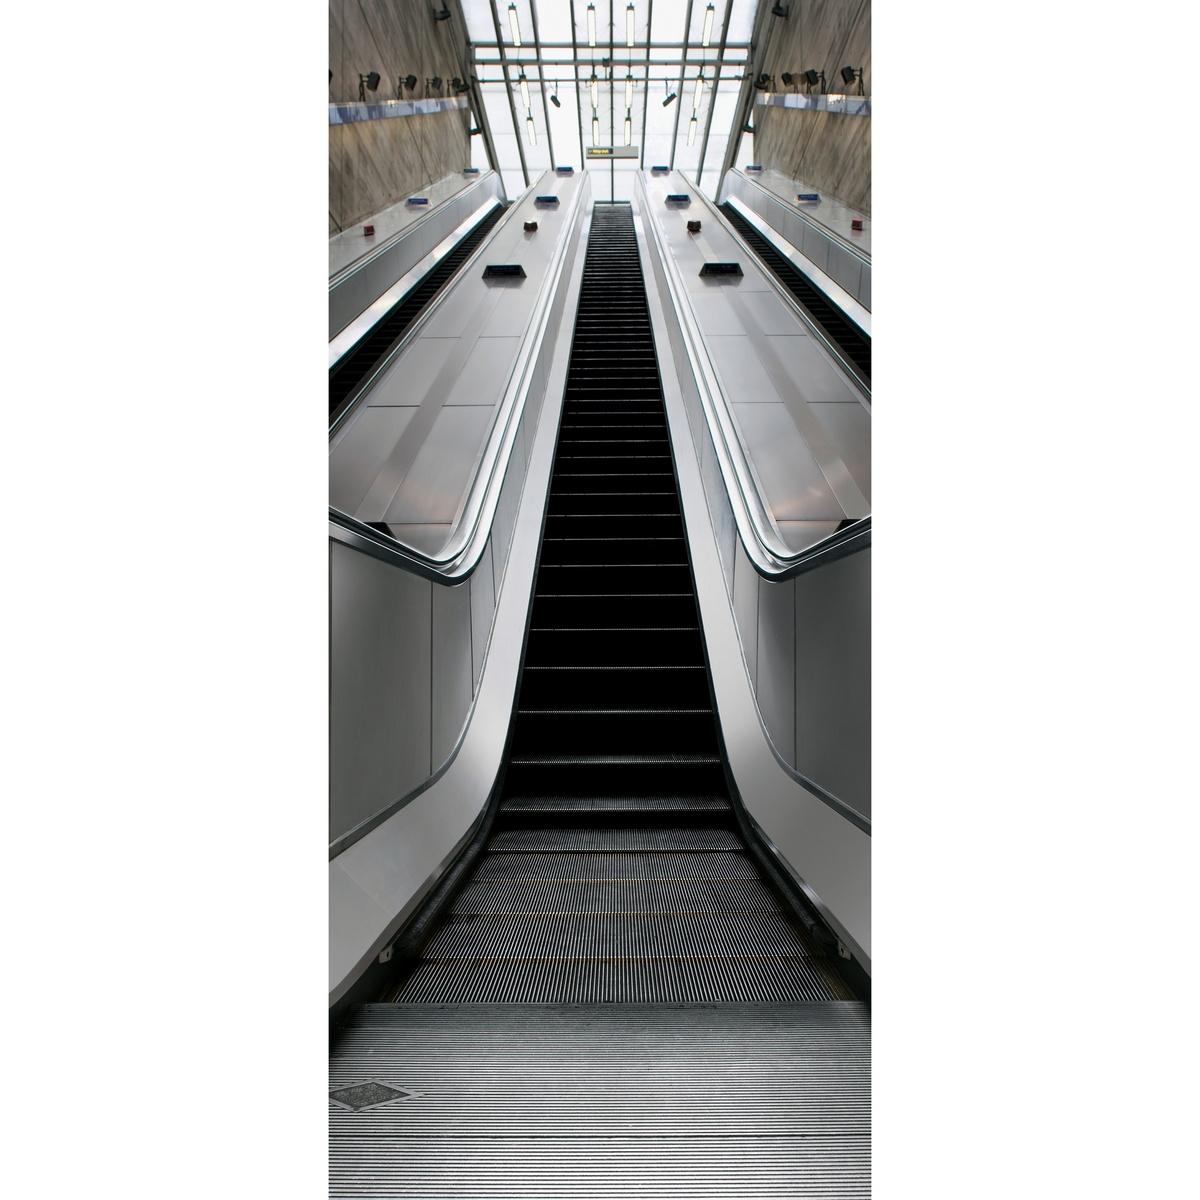 Fototapeta eskalátor 95 x 210 cm, Wall